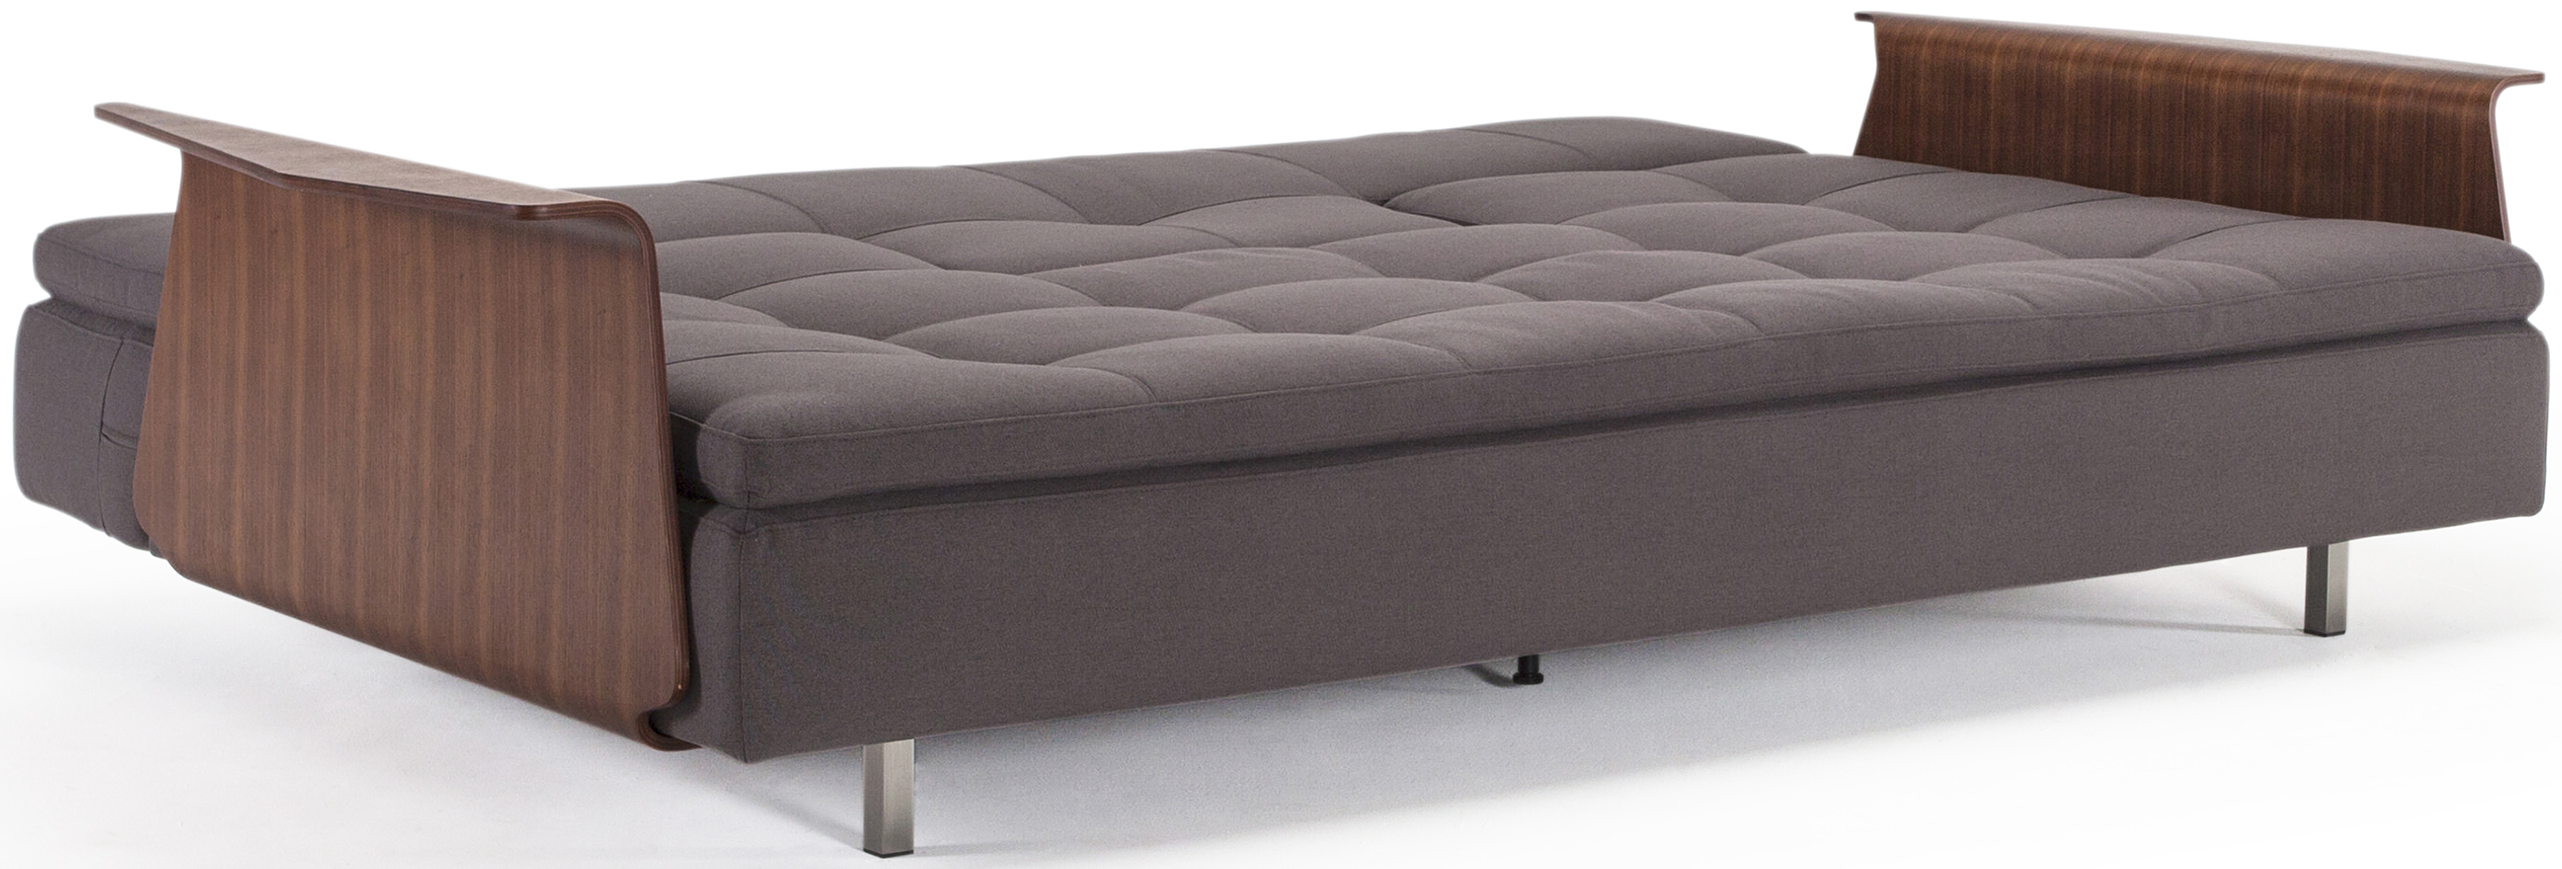 longhorn sofa dual deluxe